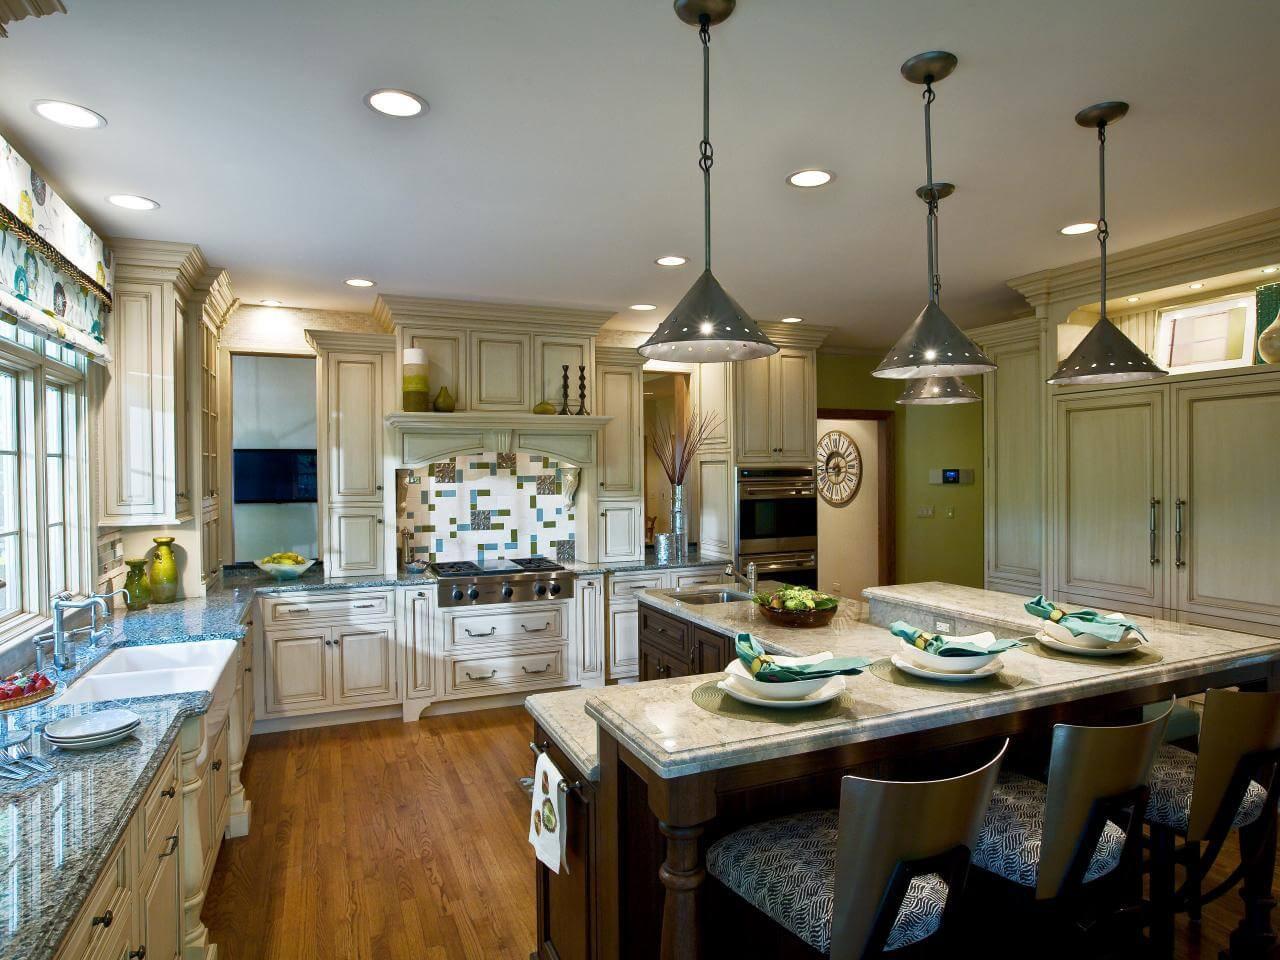 Kitchen Under Cabinet Lighting Options  Kitchen Lighting Choosing the Best Lighting for Your